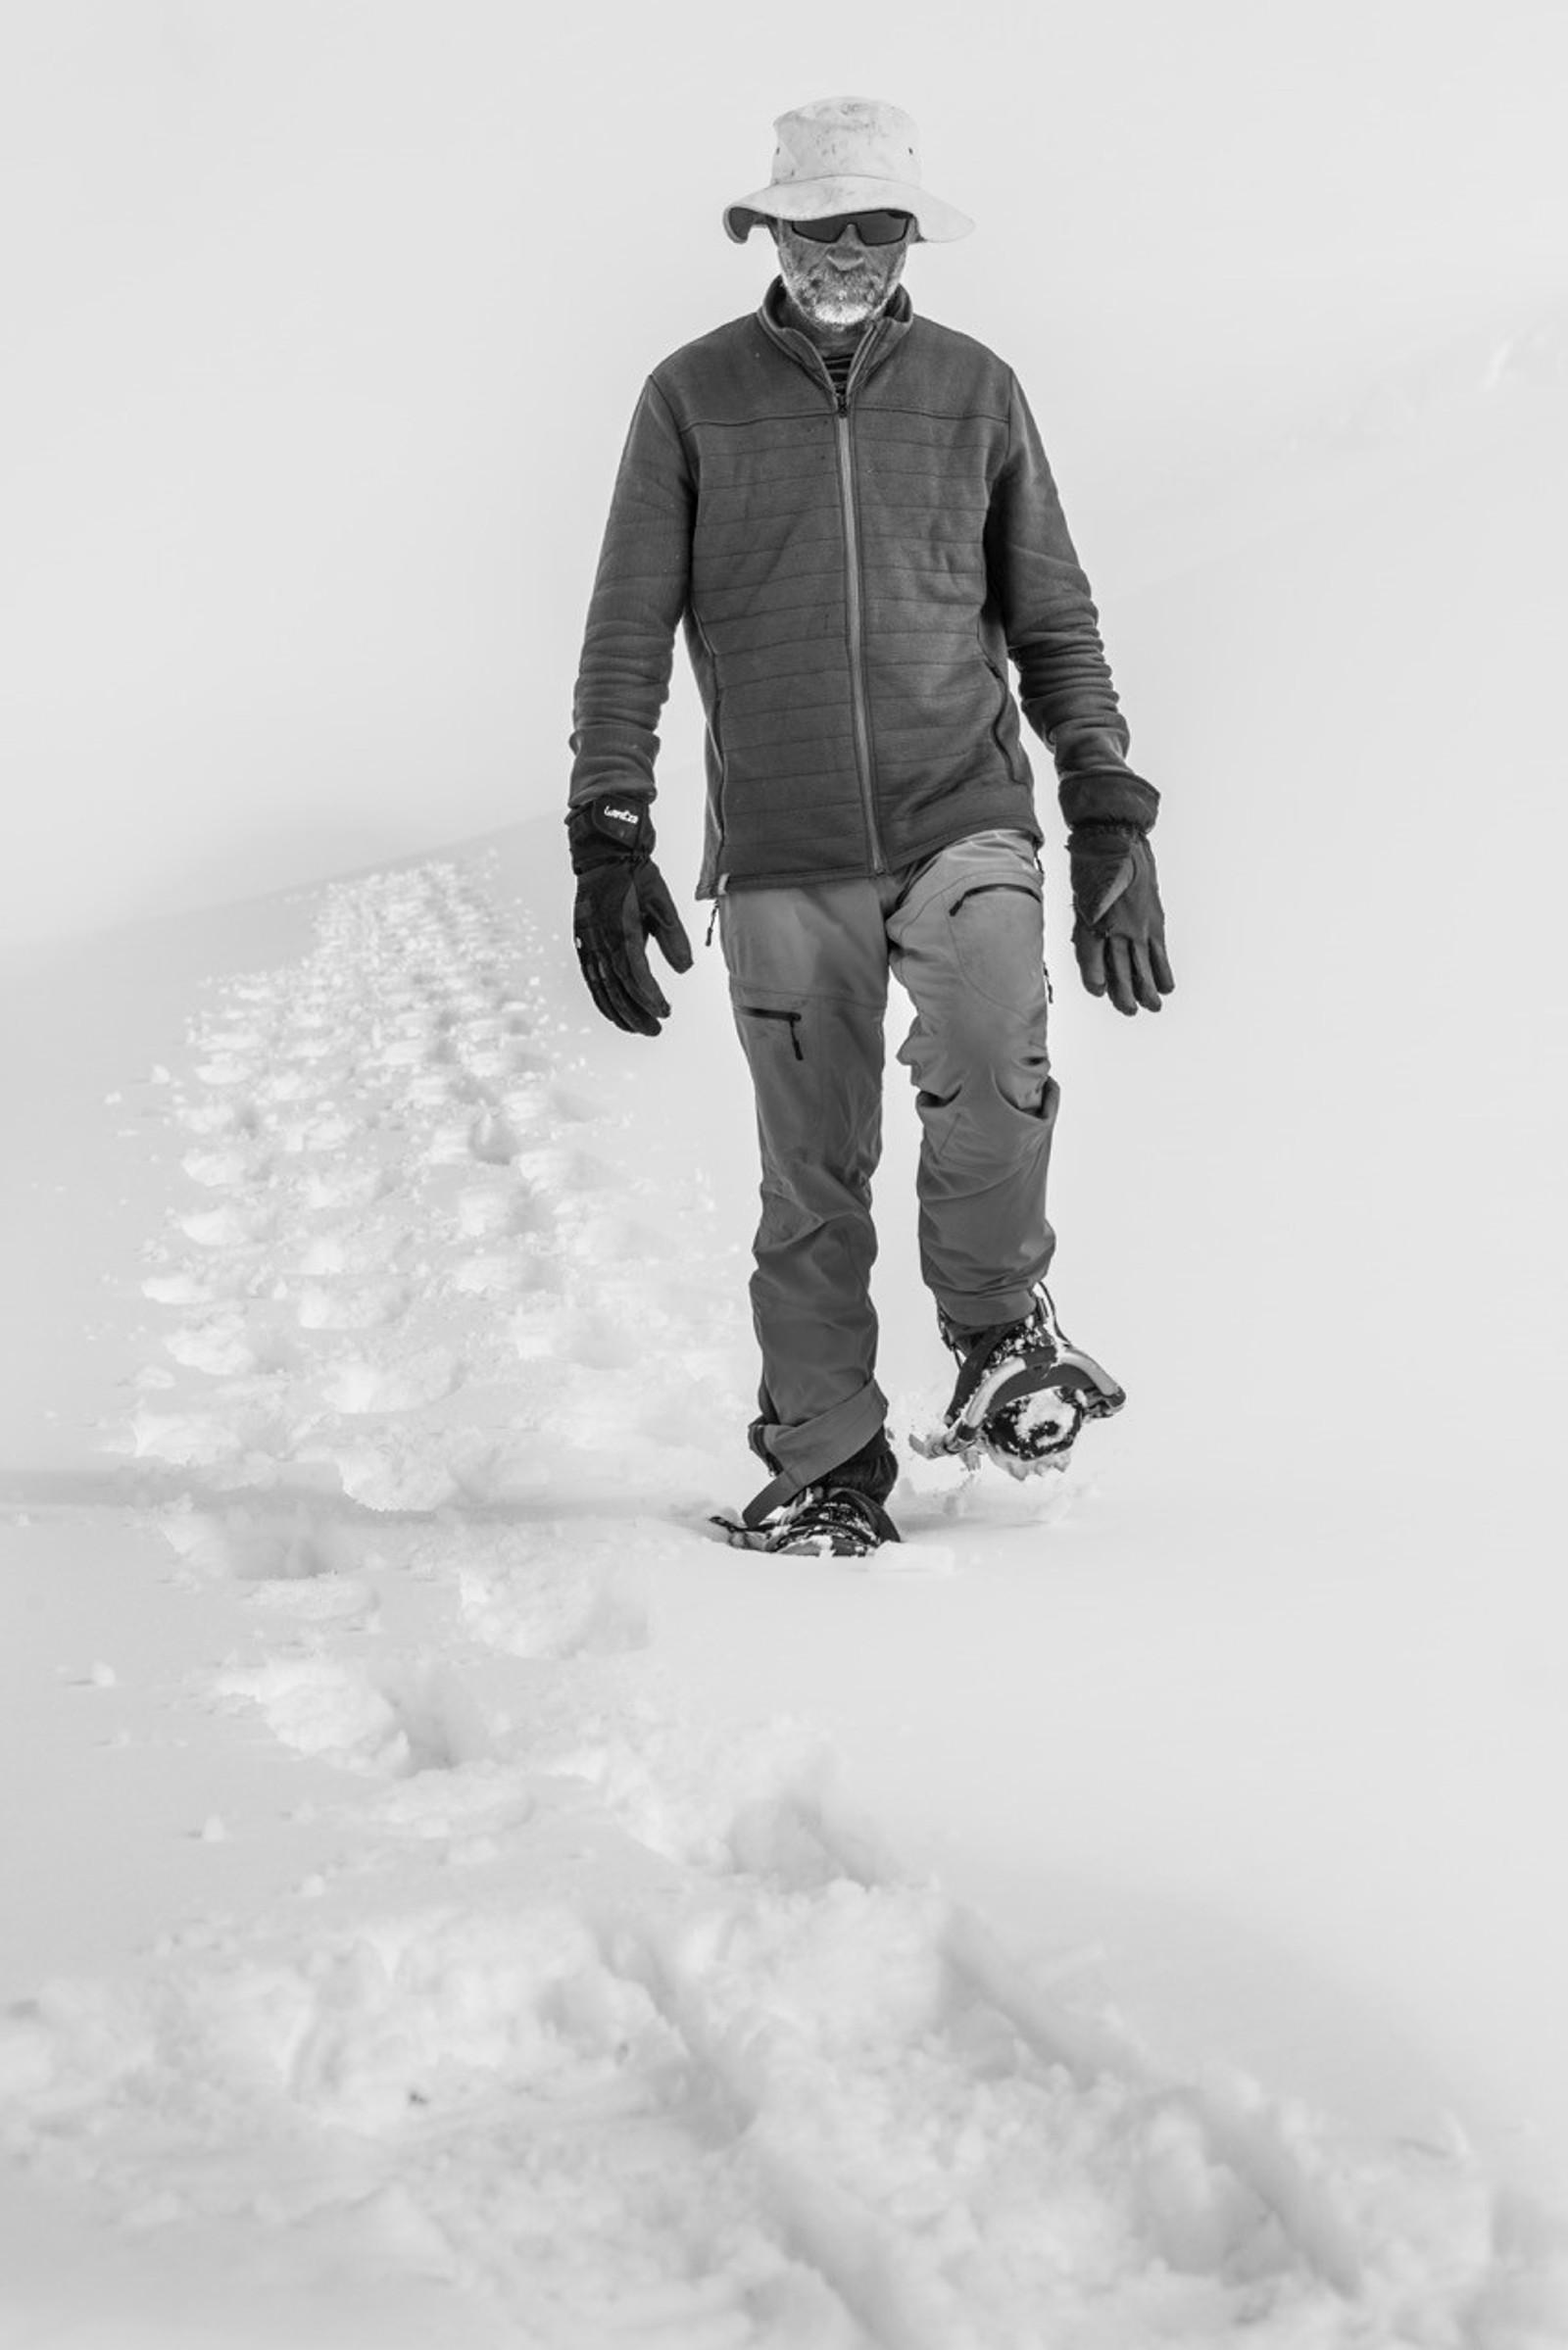 I tolv timar trakka Simon Beck rundt i snøen på trugene sine.